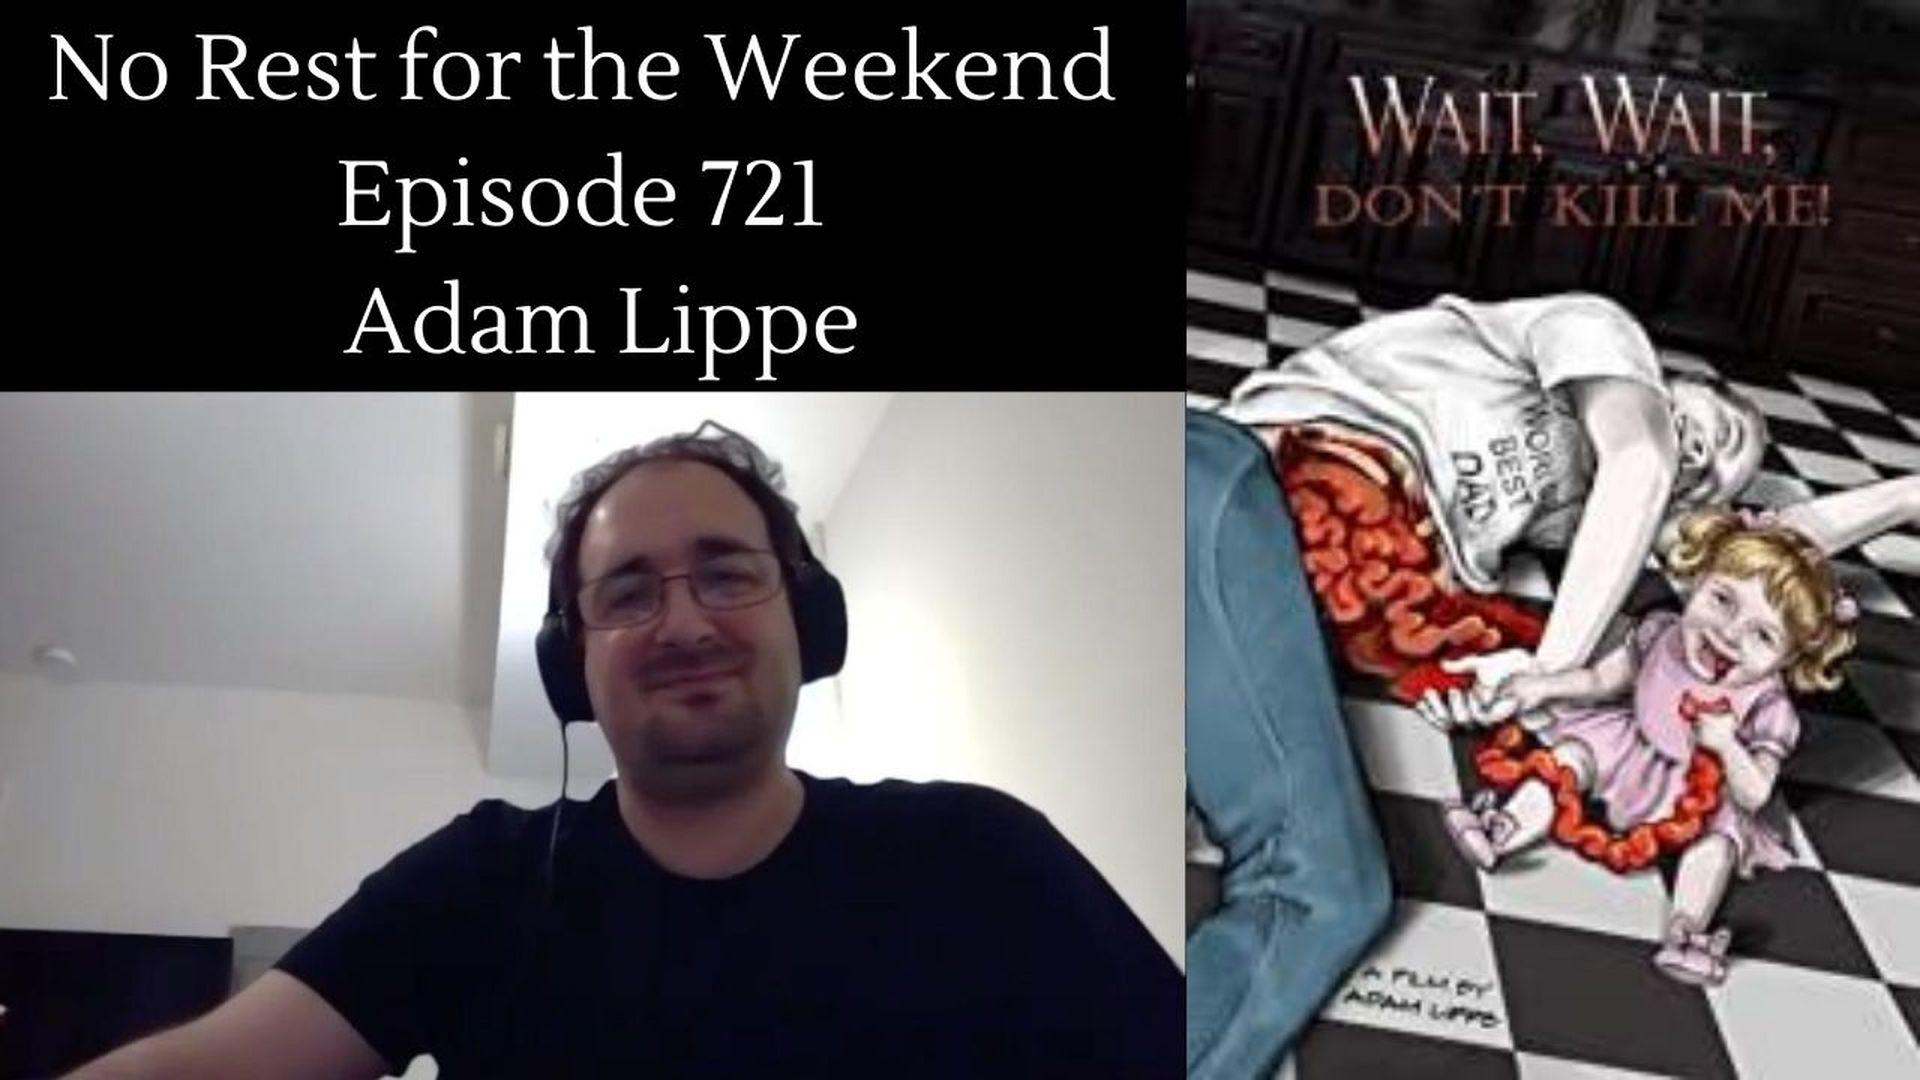 Episode 721: Adam Lippe